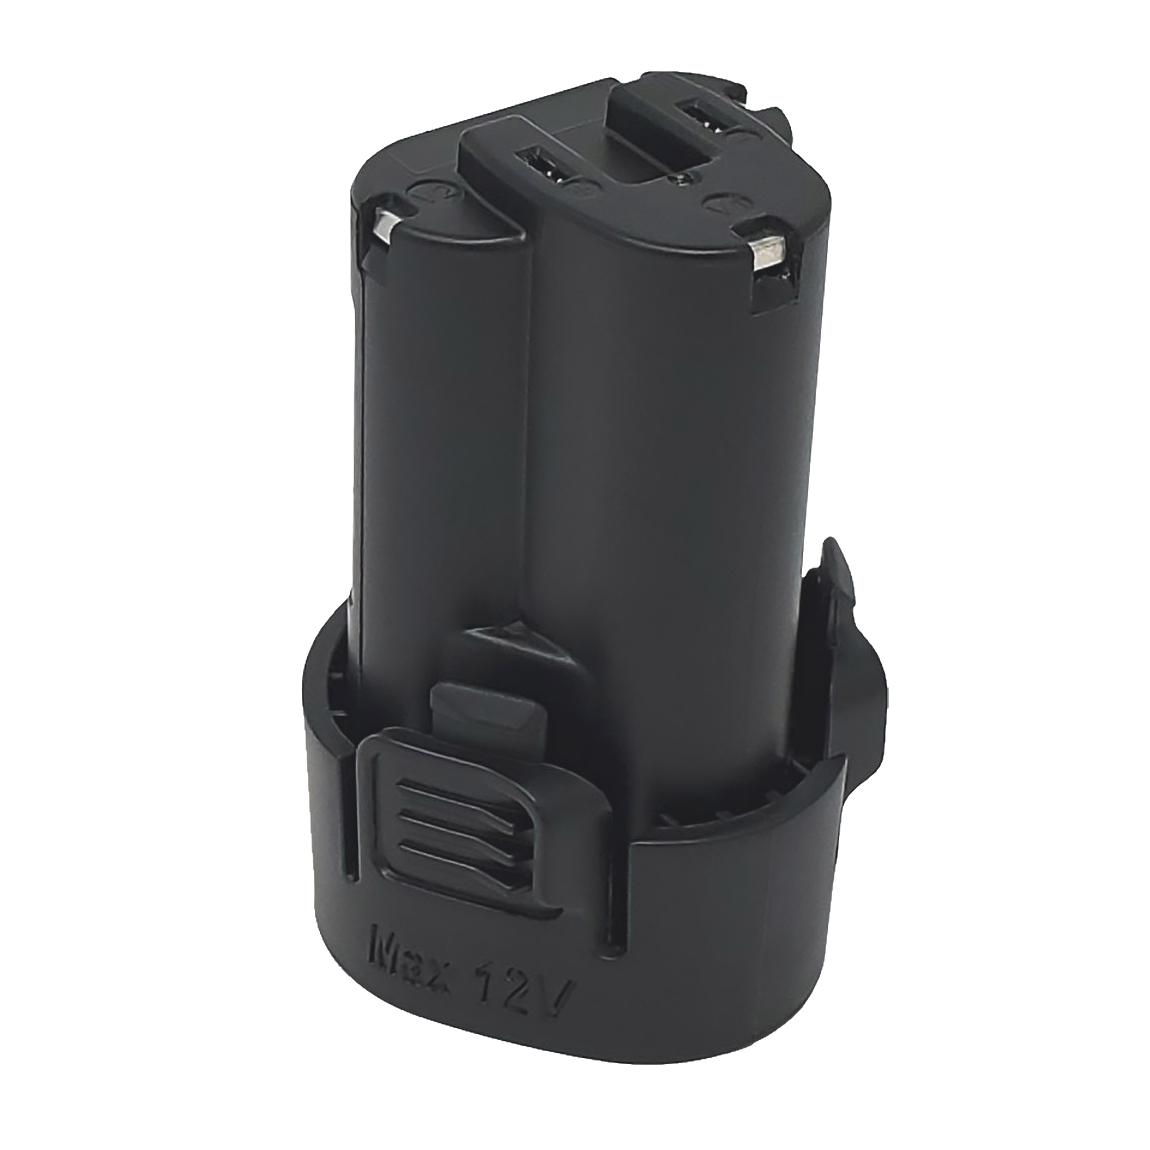 Factory Essentials Fits Dewalt DCB120 1.5Ah 12 Volt Lithium Ion Battery 3 Pack